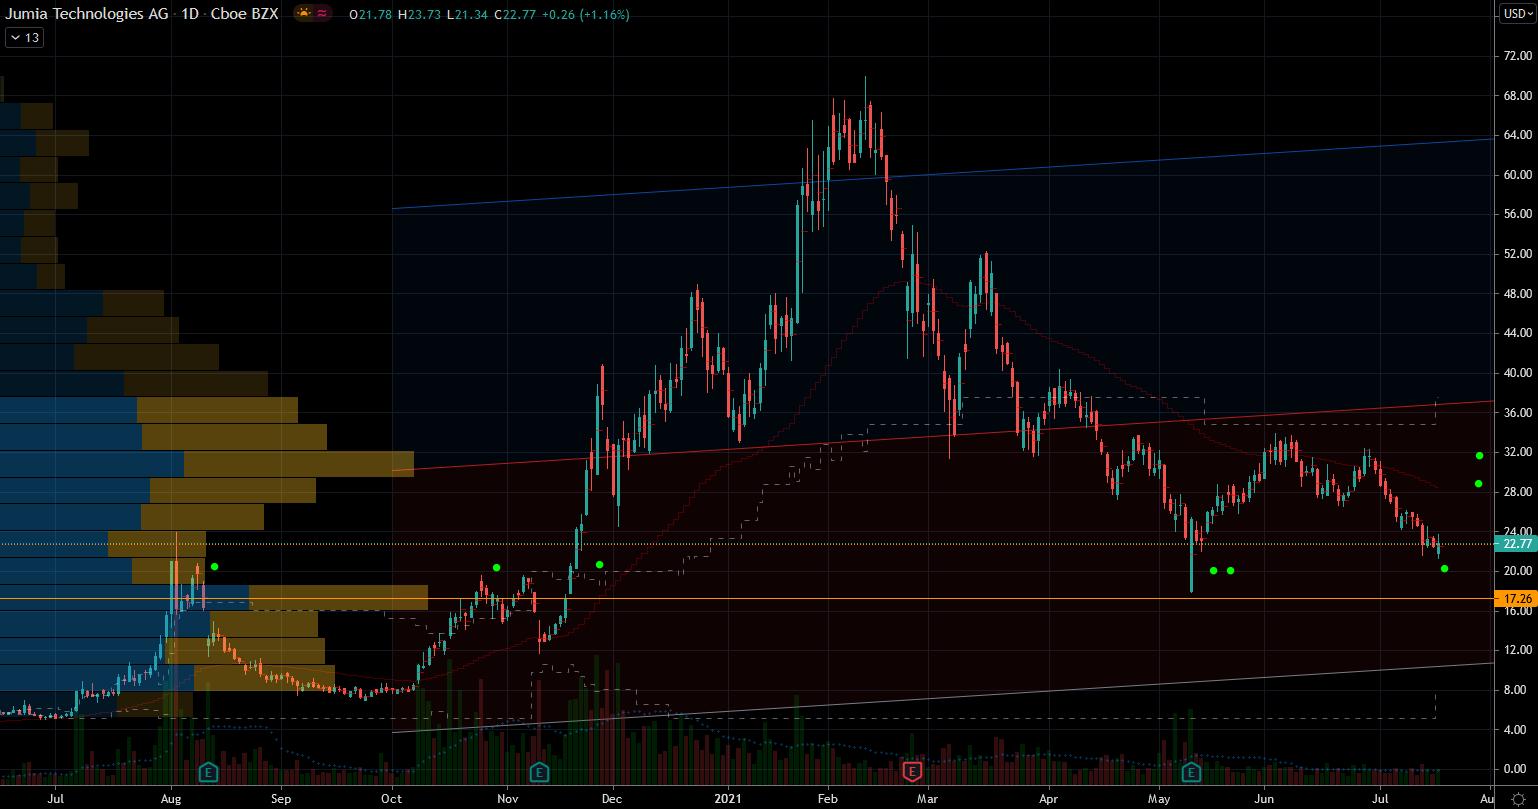 Jumia (JMIA) Stock Chart Showing Potential Base